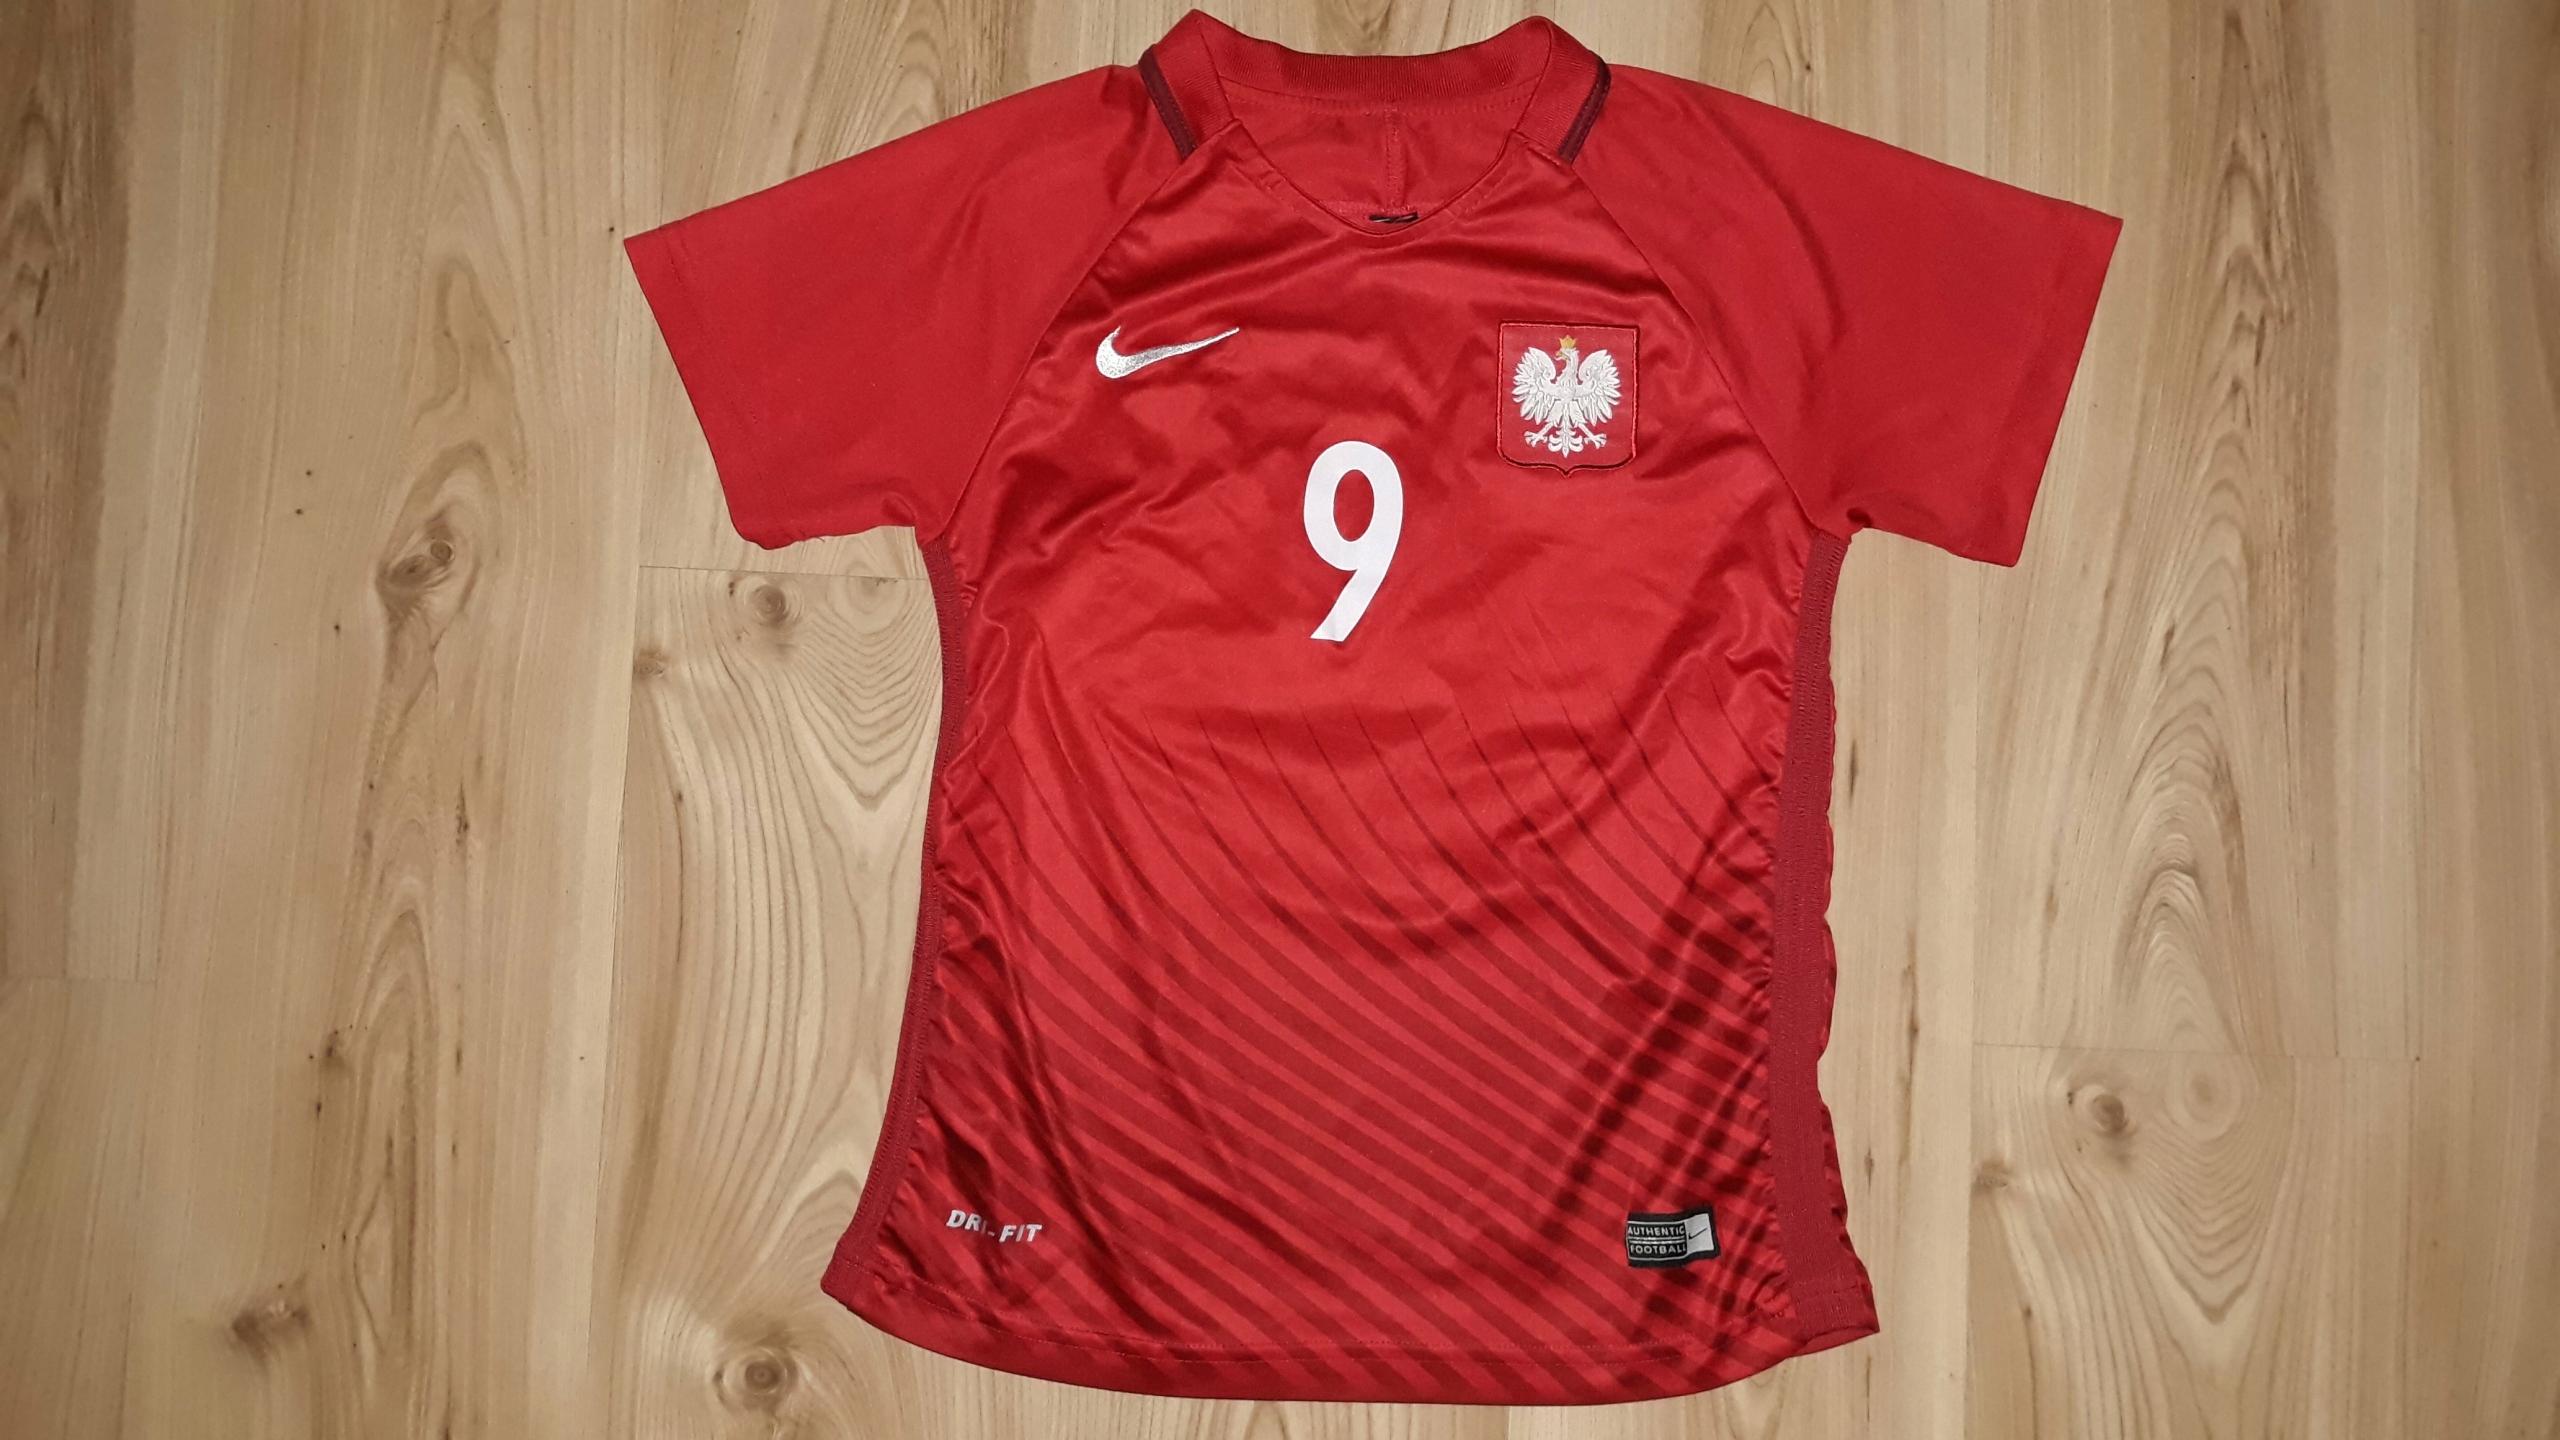 809591b38926 Koszulka Reprezentacji Polski S Nike Lewandowski 9 - 7605514546 - oficjalne  archiwum allegro